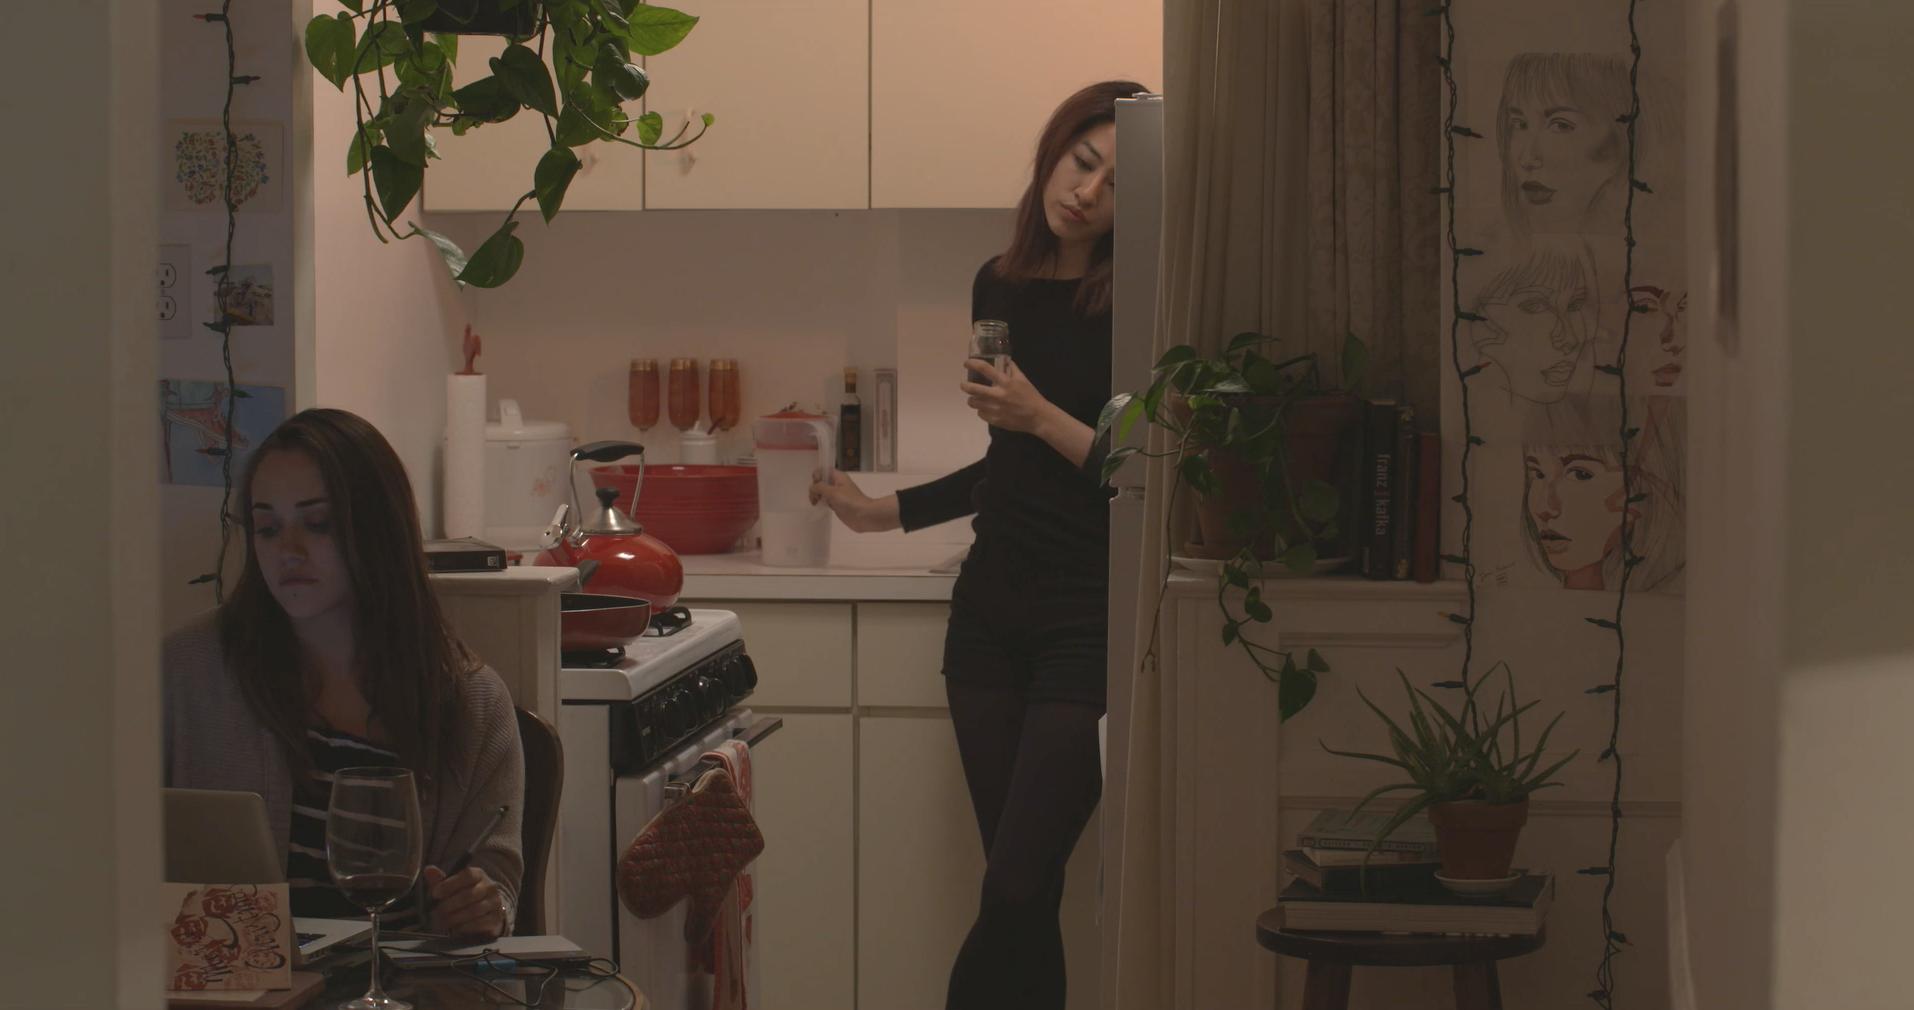 scene from caroline's short film, ' us '